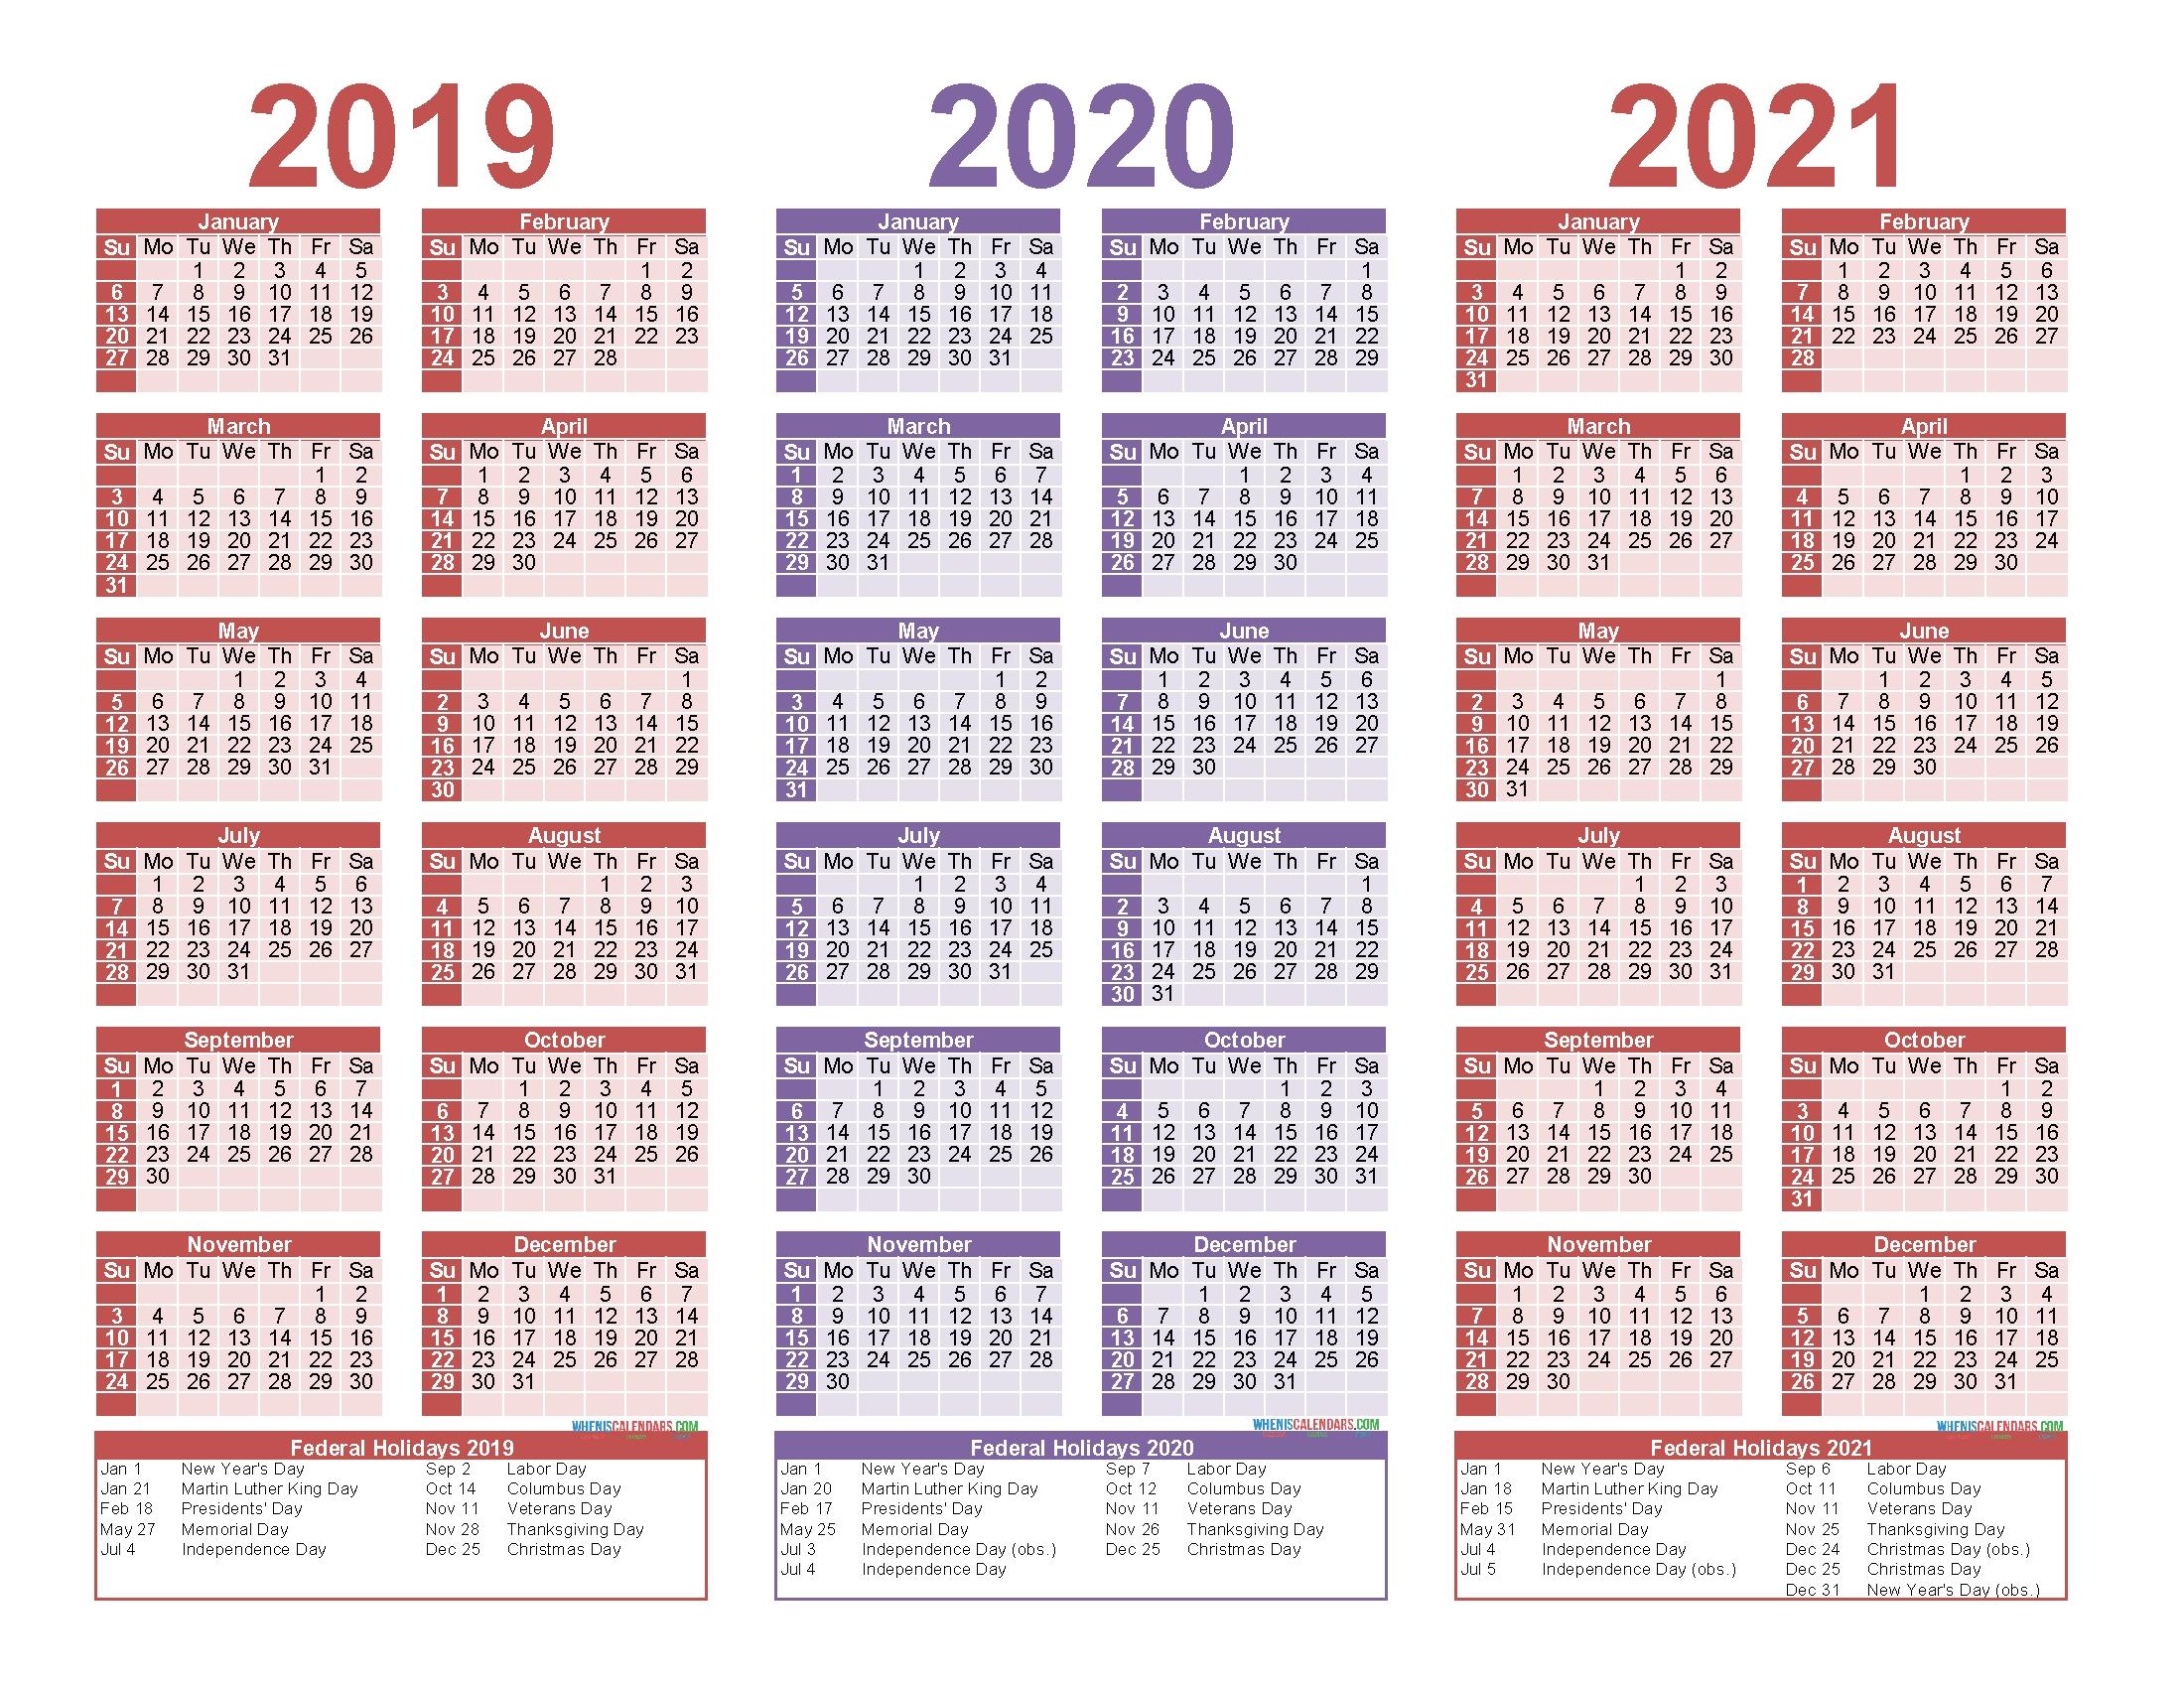 2019 And 2020 And 2021 Calendar Printable Pdf, Word – Free